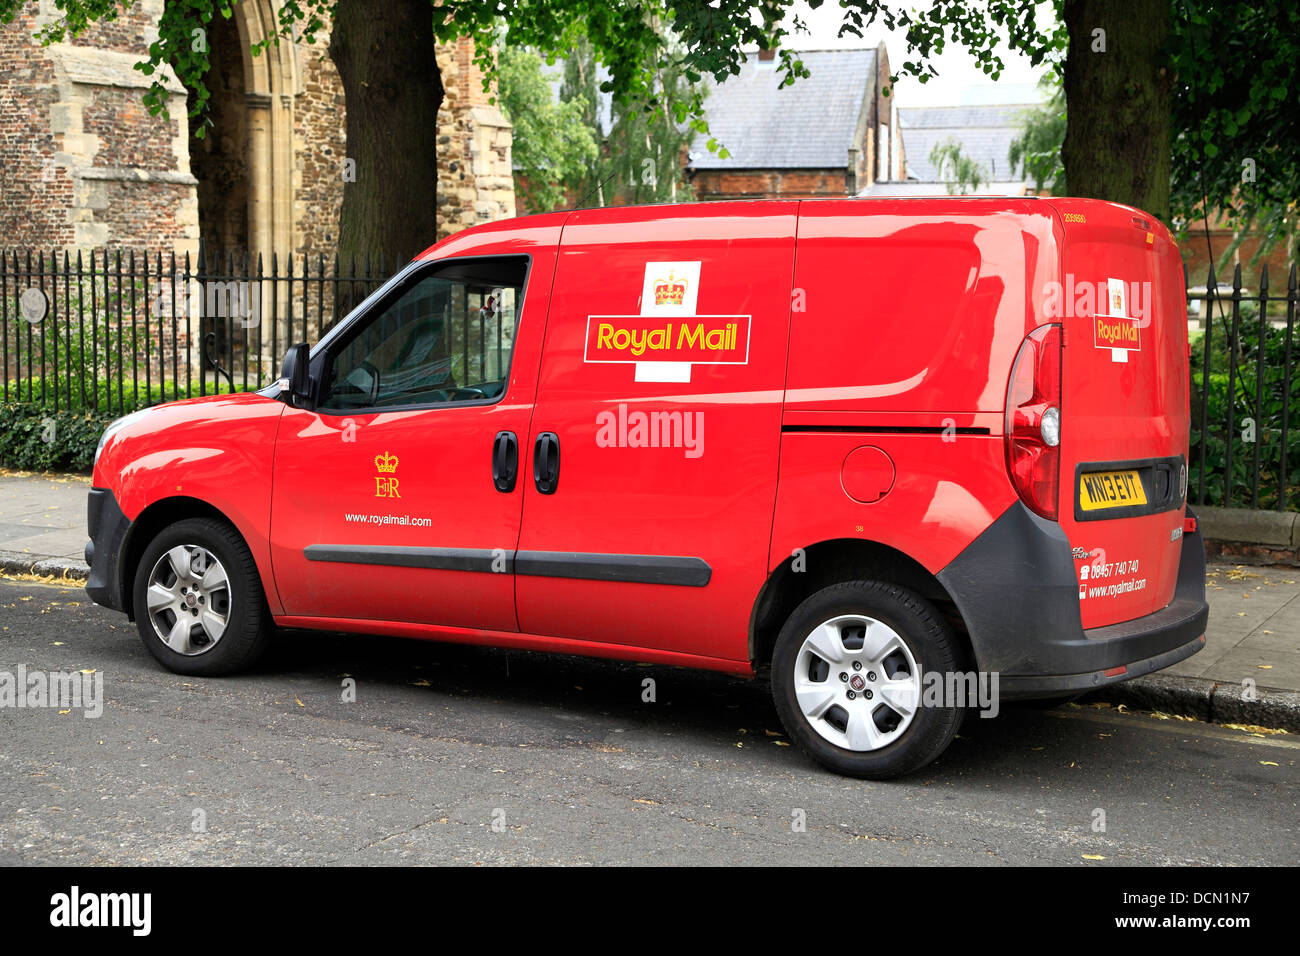 Royal Mail van, Fahrzeug, England, UK, Fahrzeuge Transporter Transport Stockbild